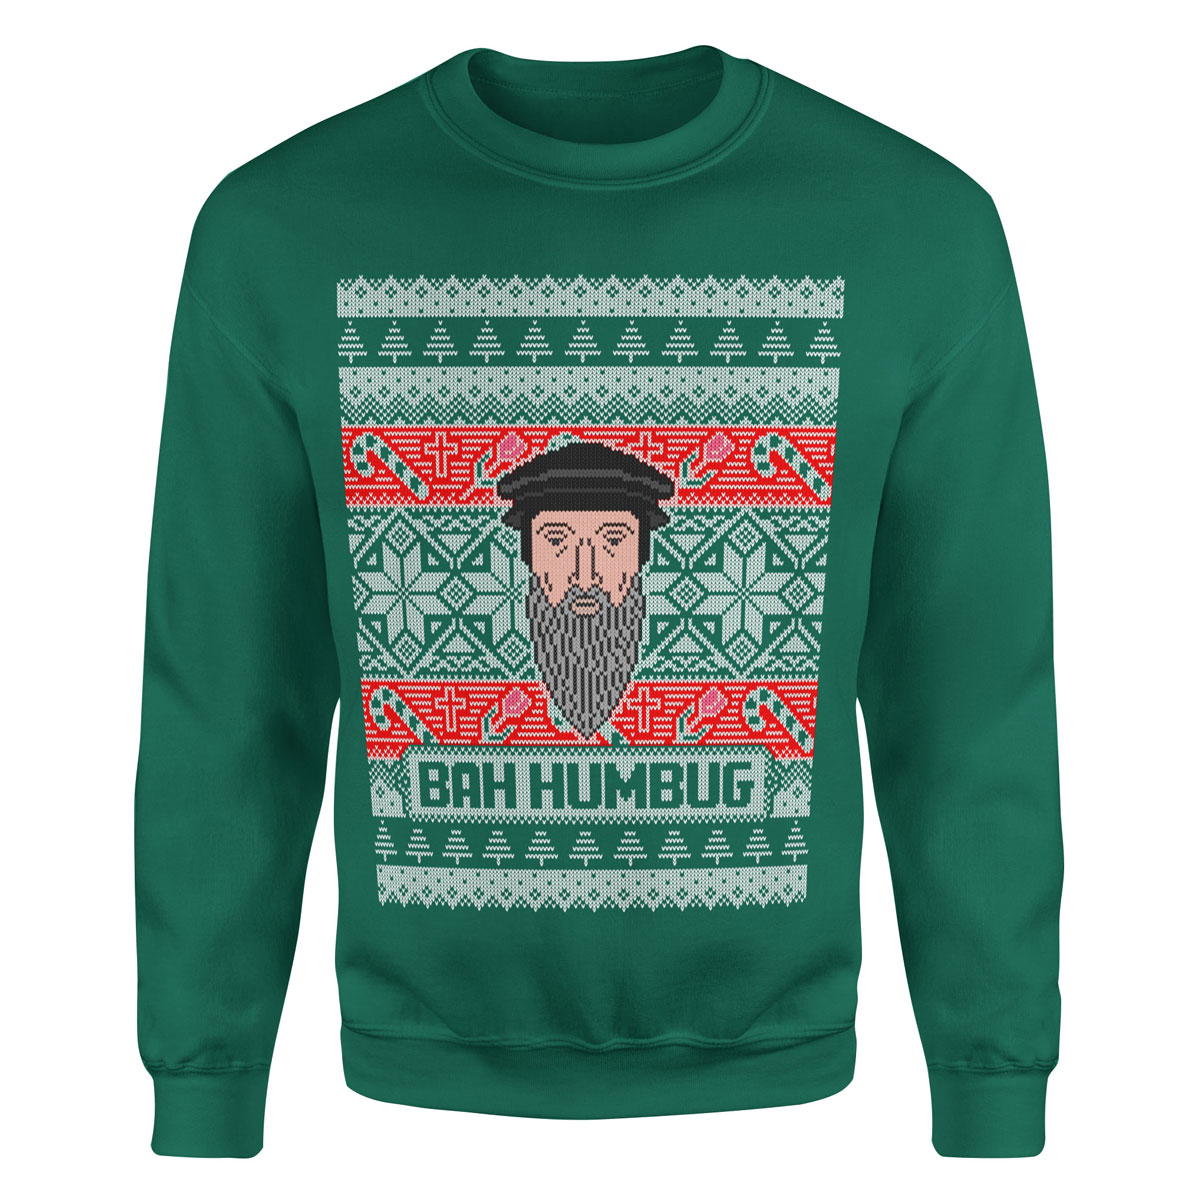 Ugly Christmas Sweater.Pre Order John Calvin Ugly Christmas Sweatshirt